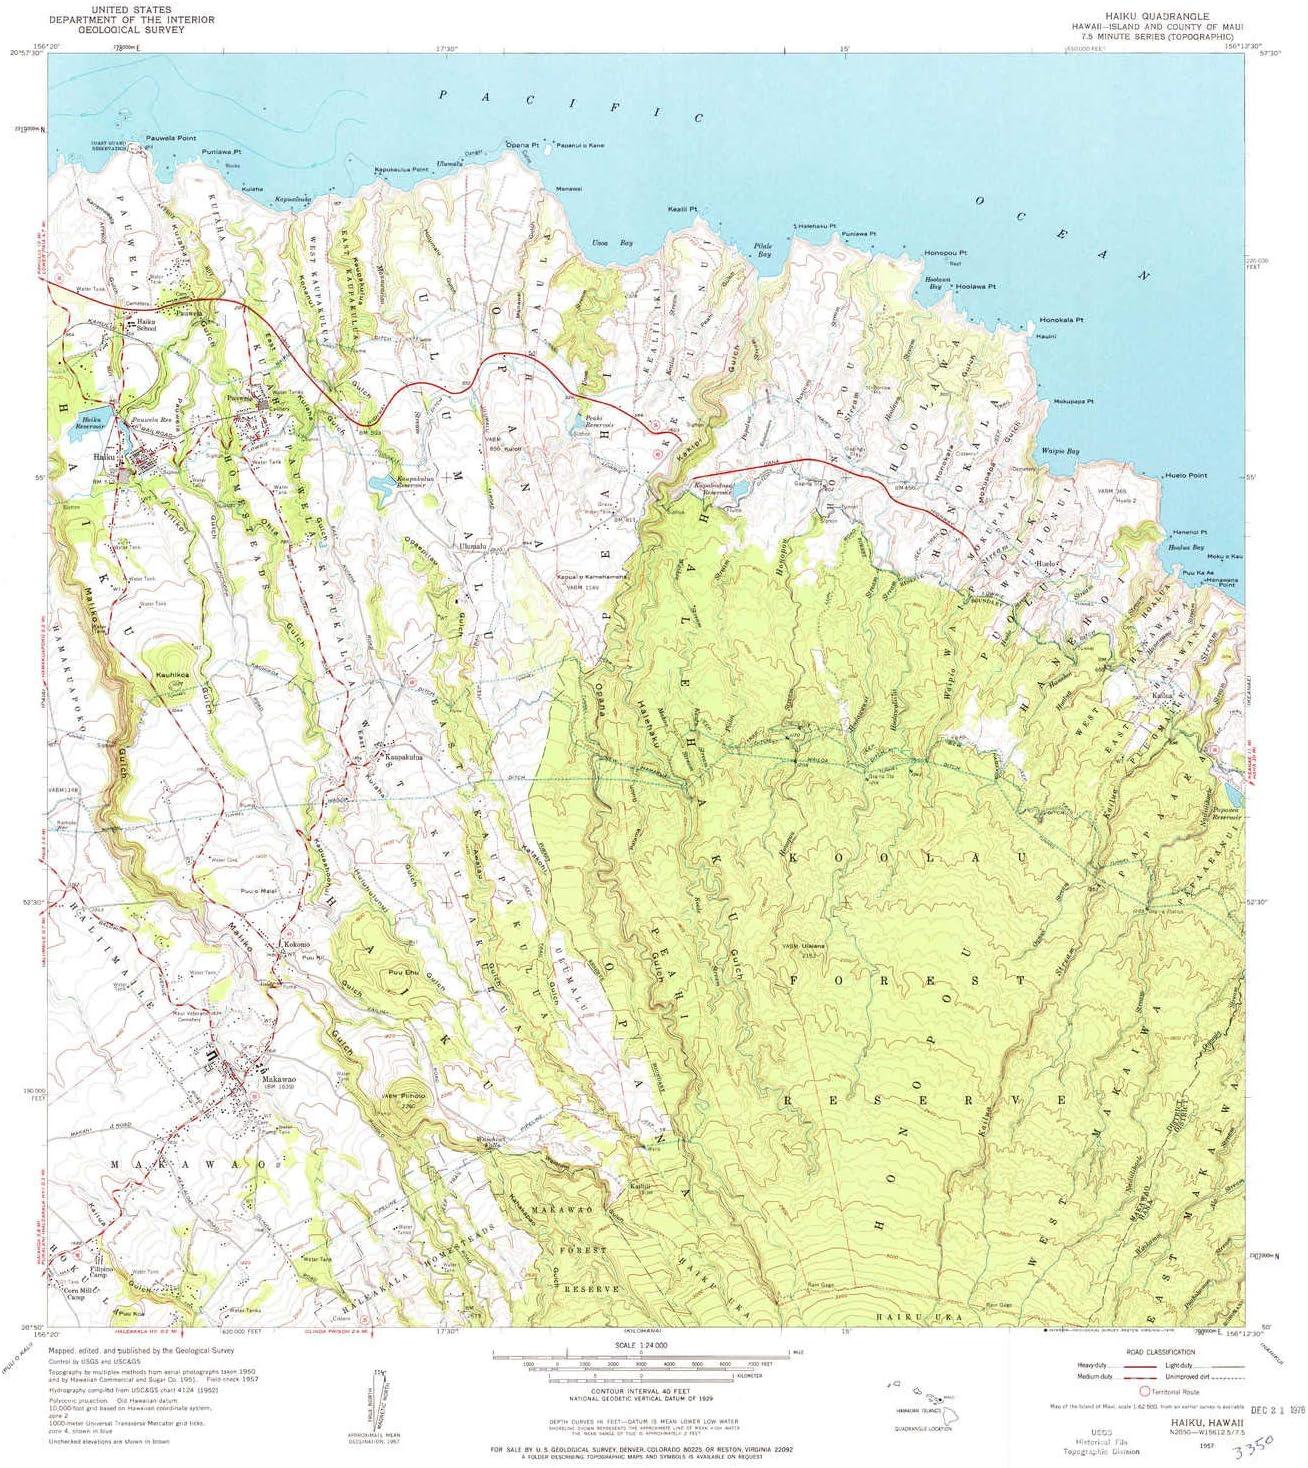 YellowMaps Haiku HI topo 卓越 map ランキング総合1位 1:24000 Scale X Minute 7.5 H